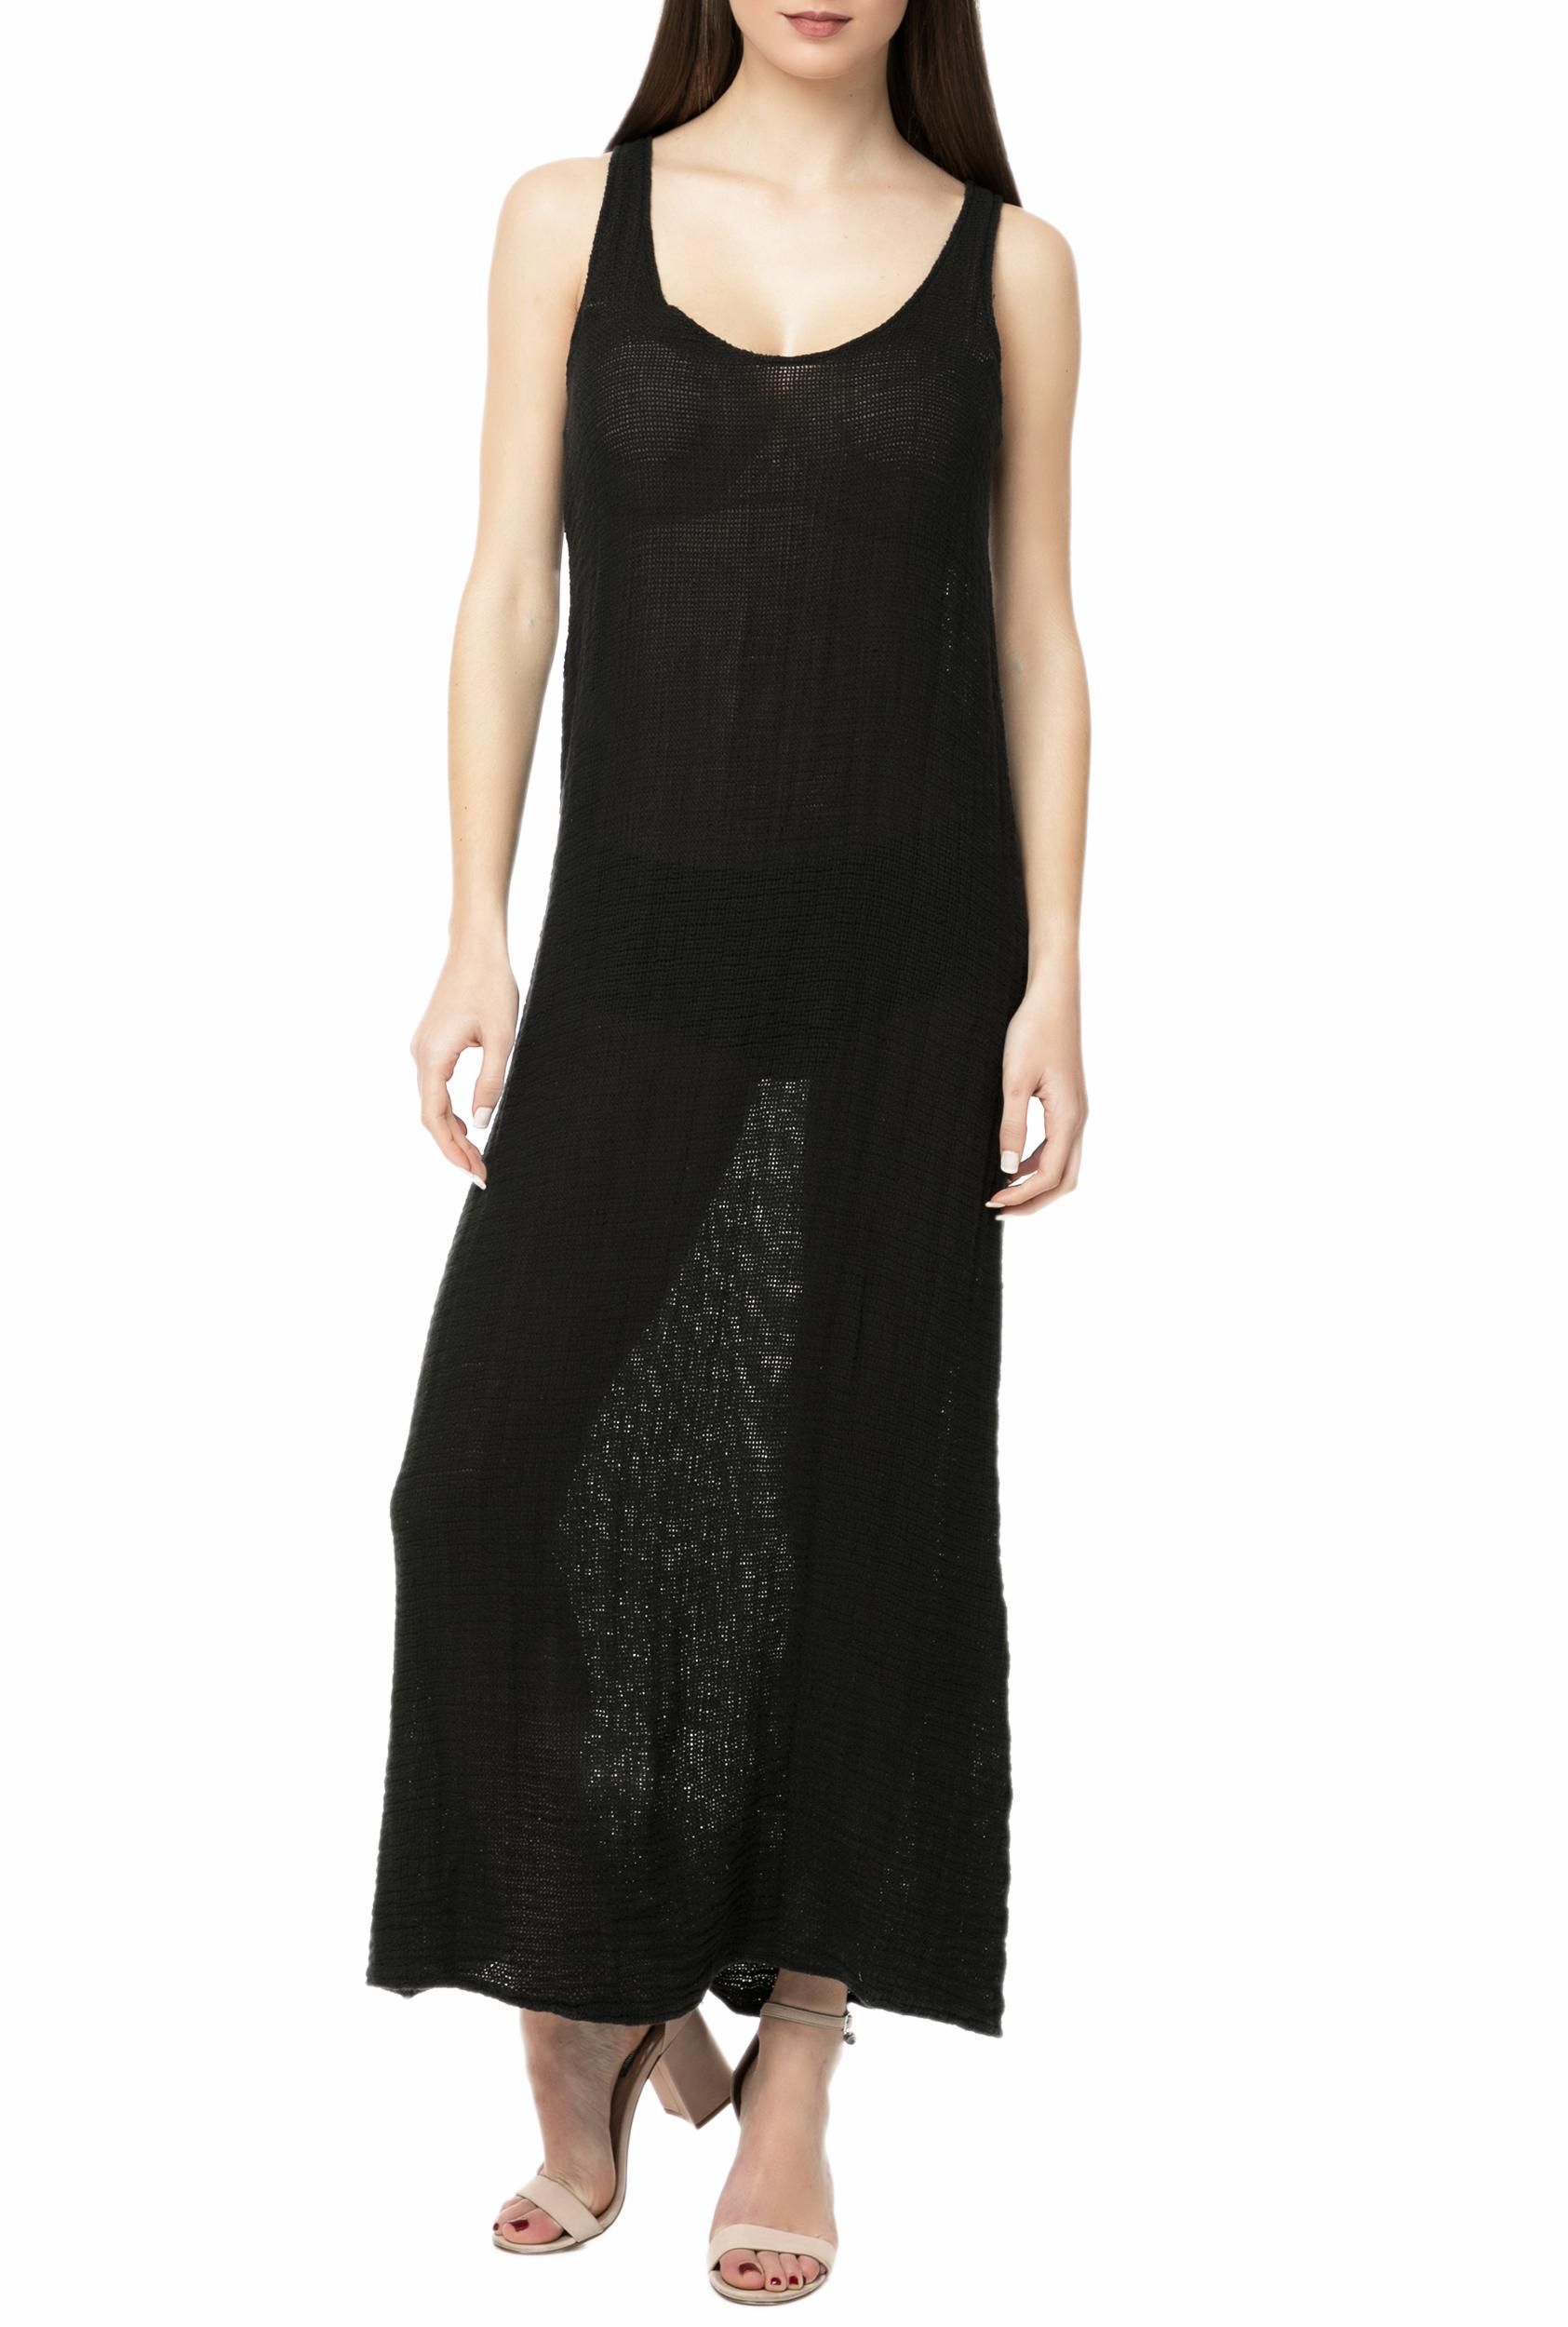 a5f8acaa2c LA DOLLS - Γυναικείο maxi φόρεμα L.A. DOLLS FRESH DRESS μαύρο